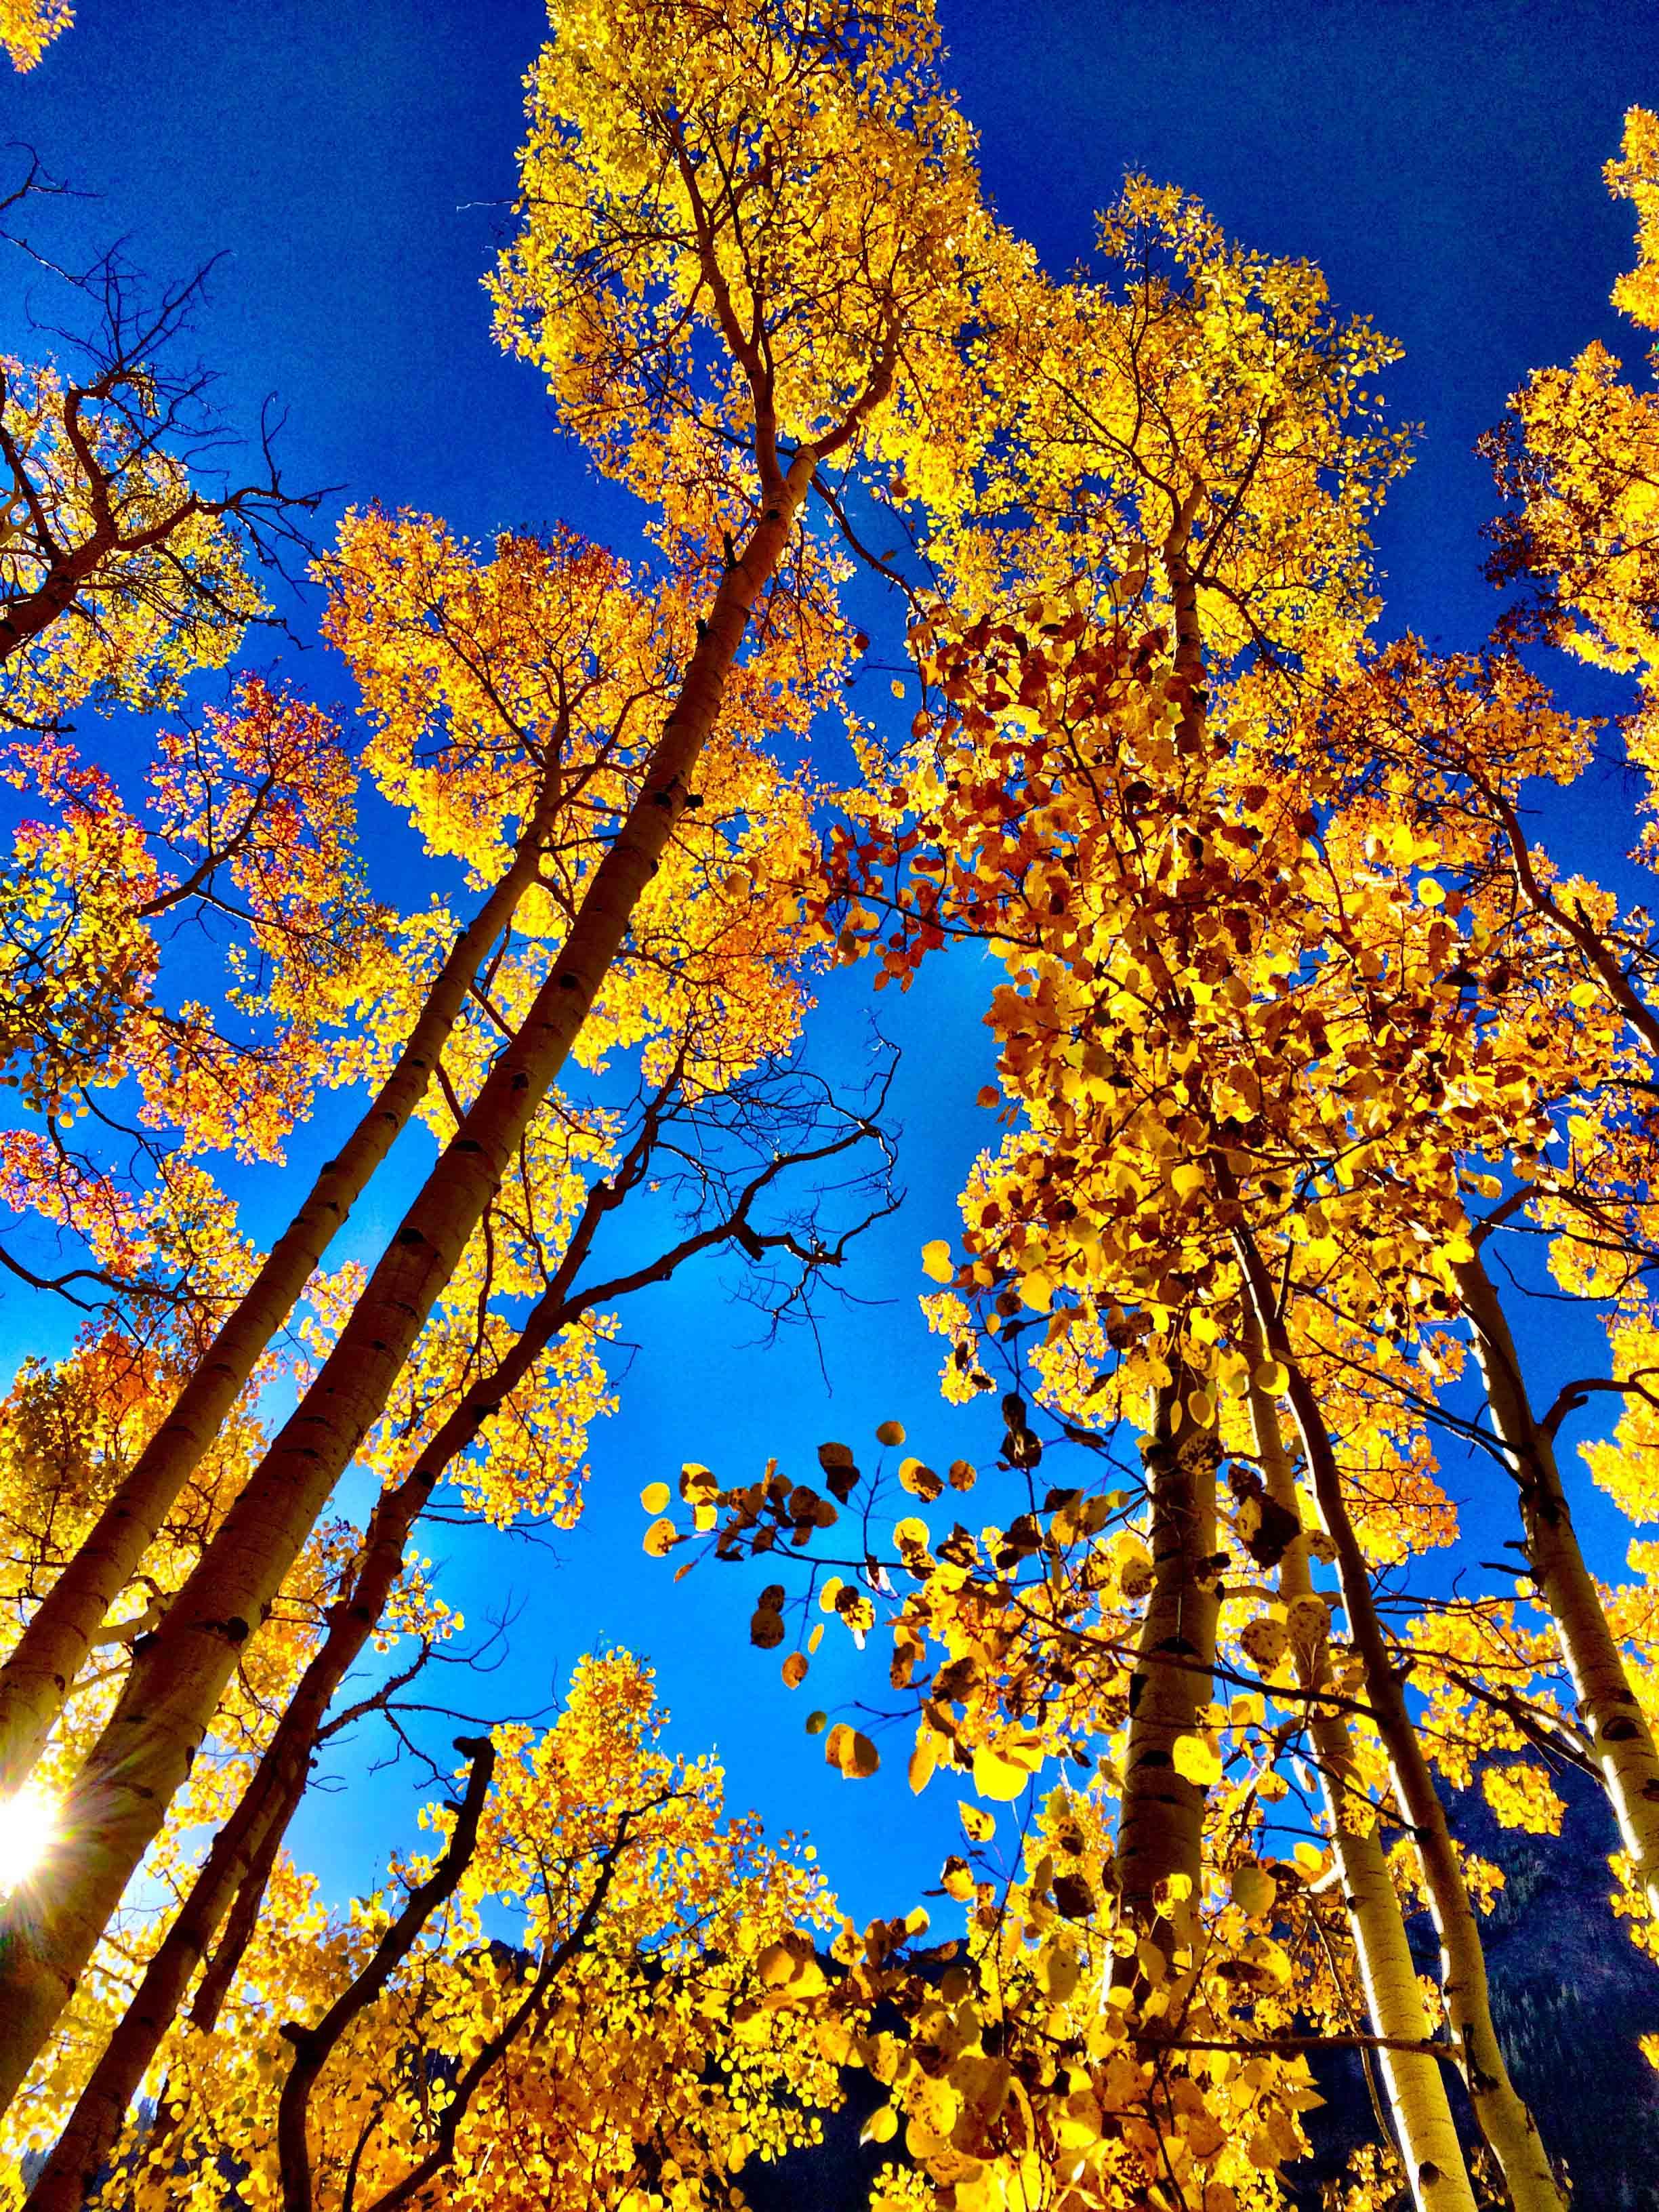 Maroon Bells, Colorado, September 2015